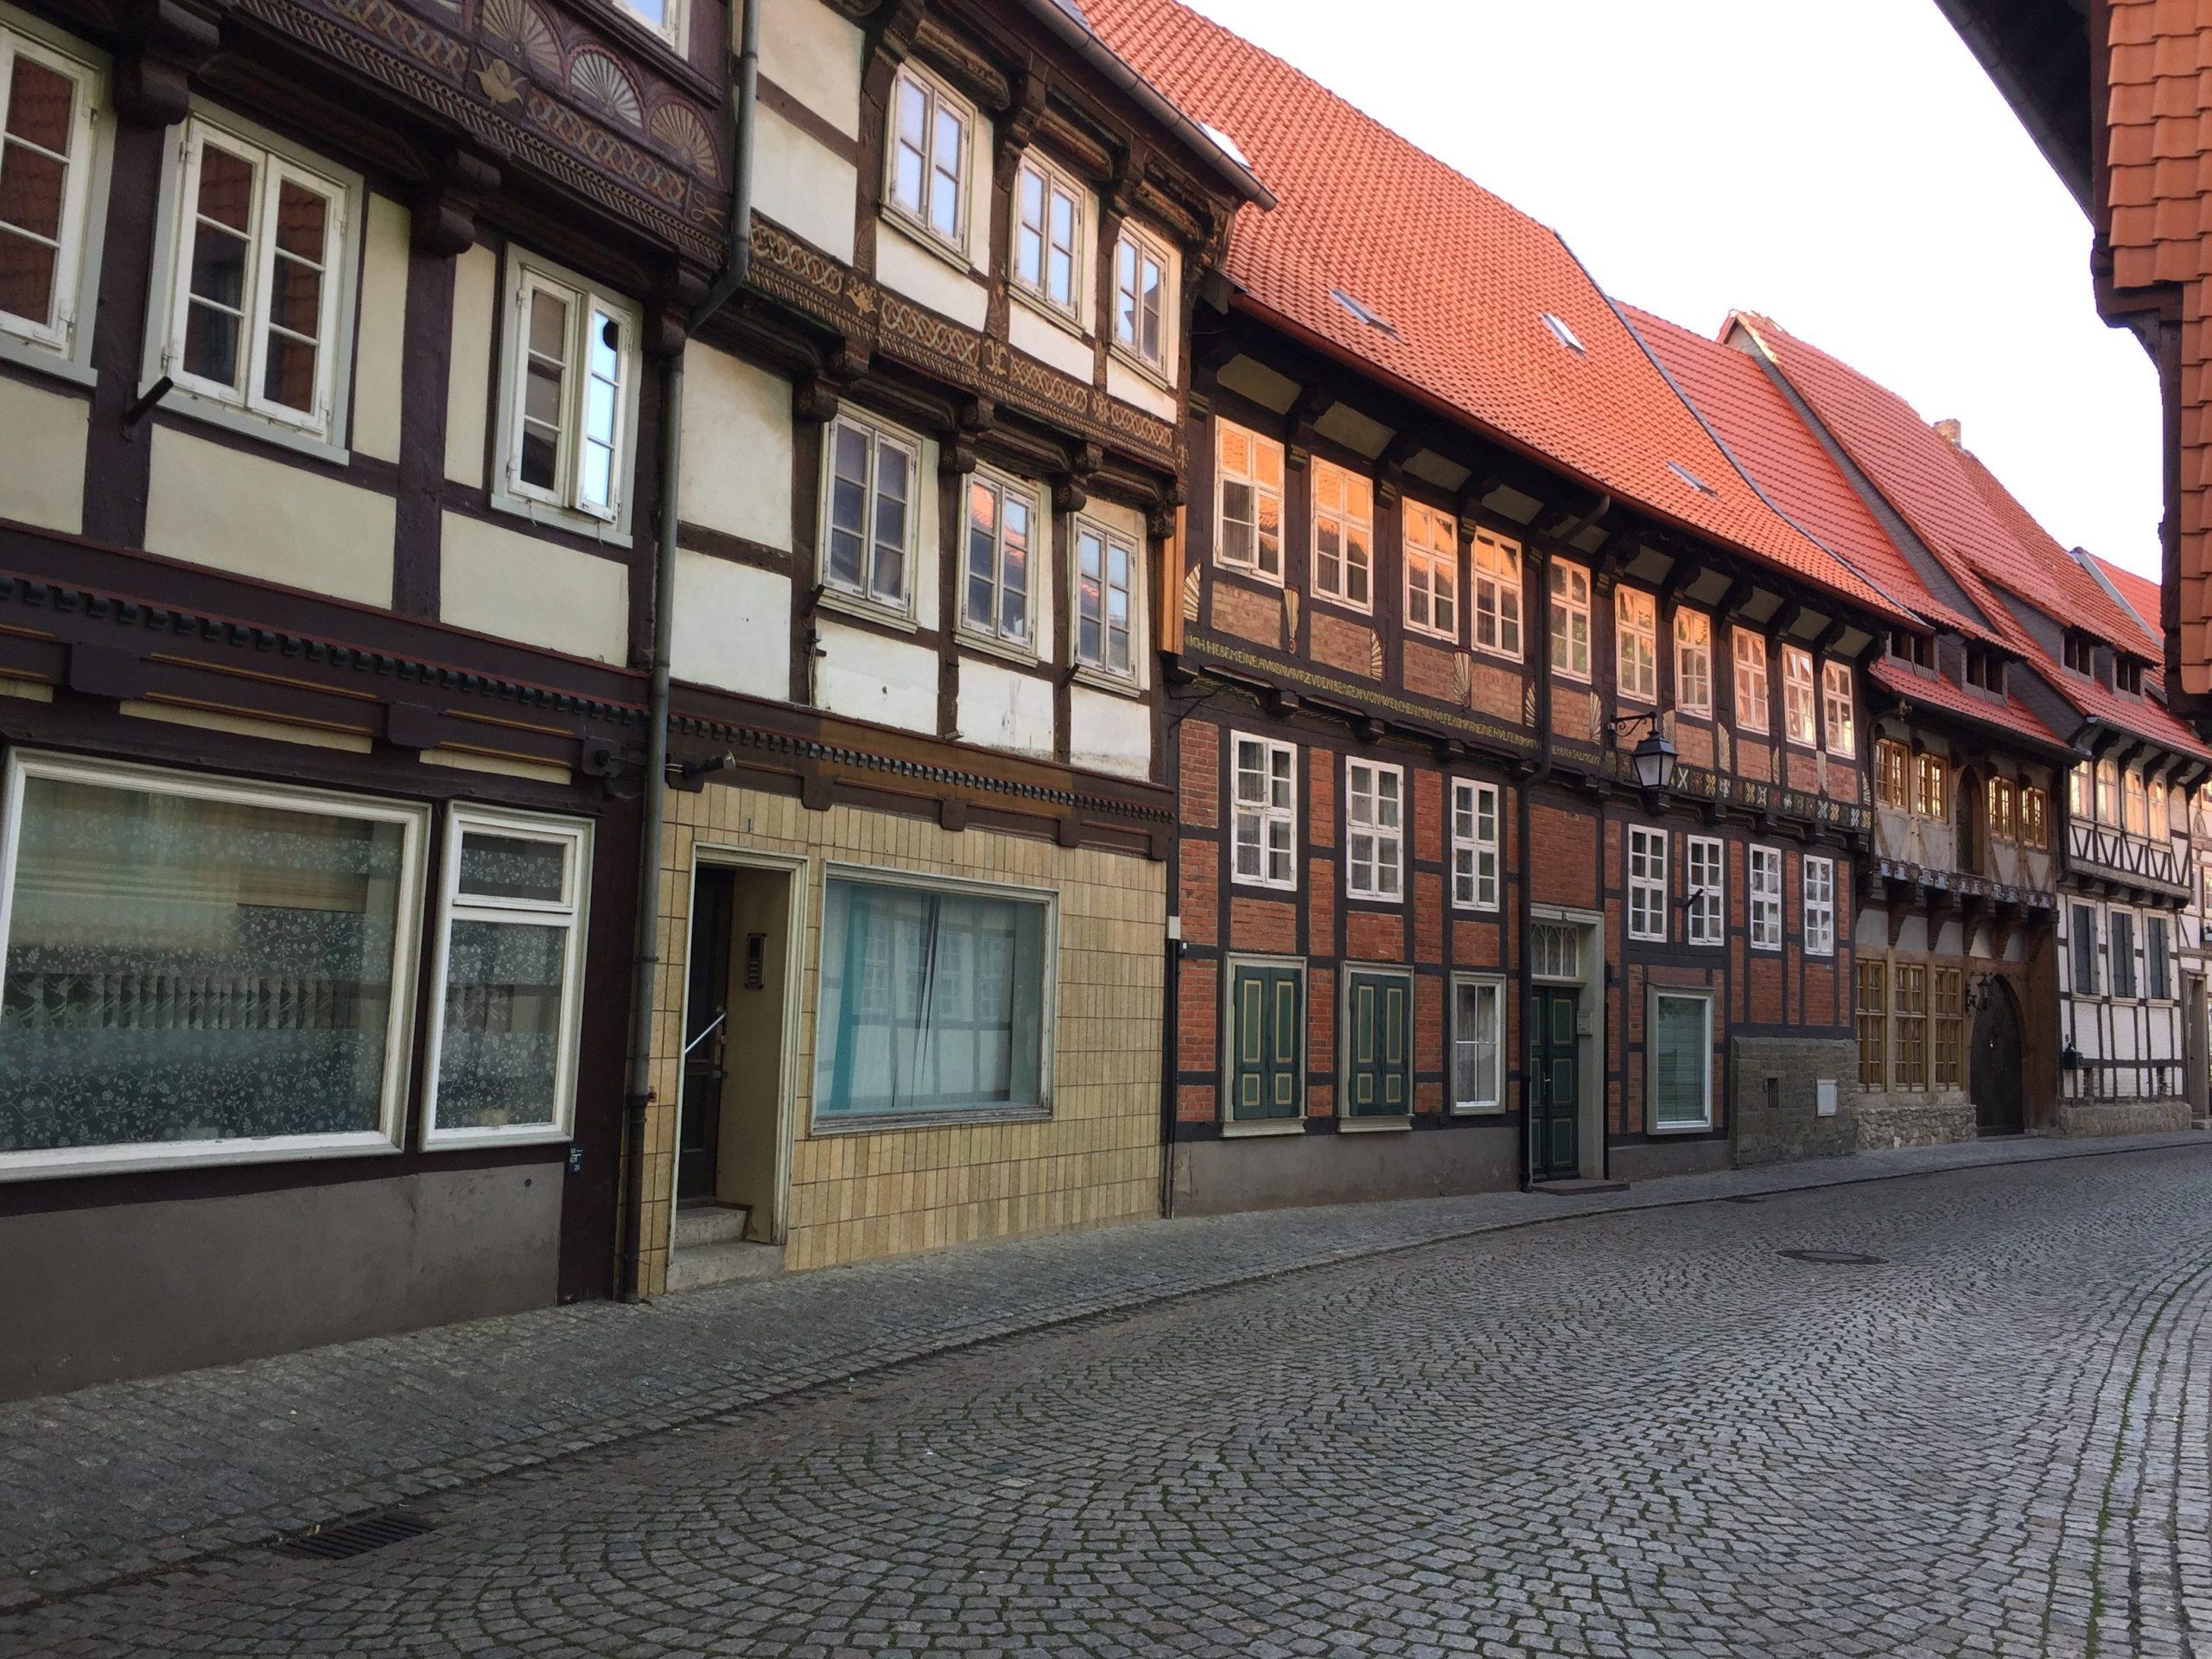 Hornburg